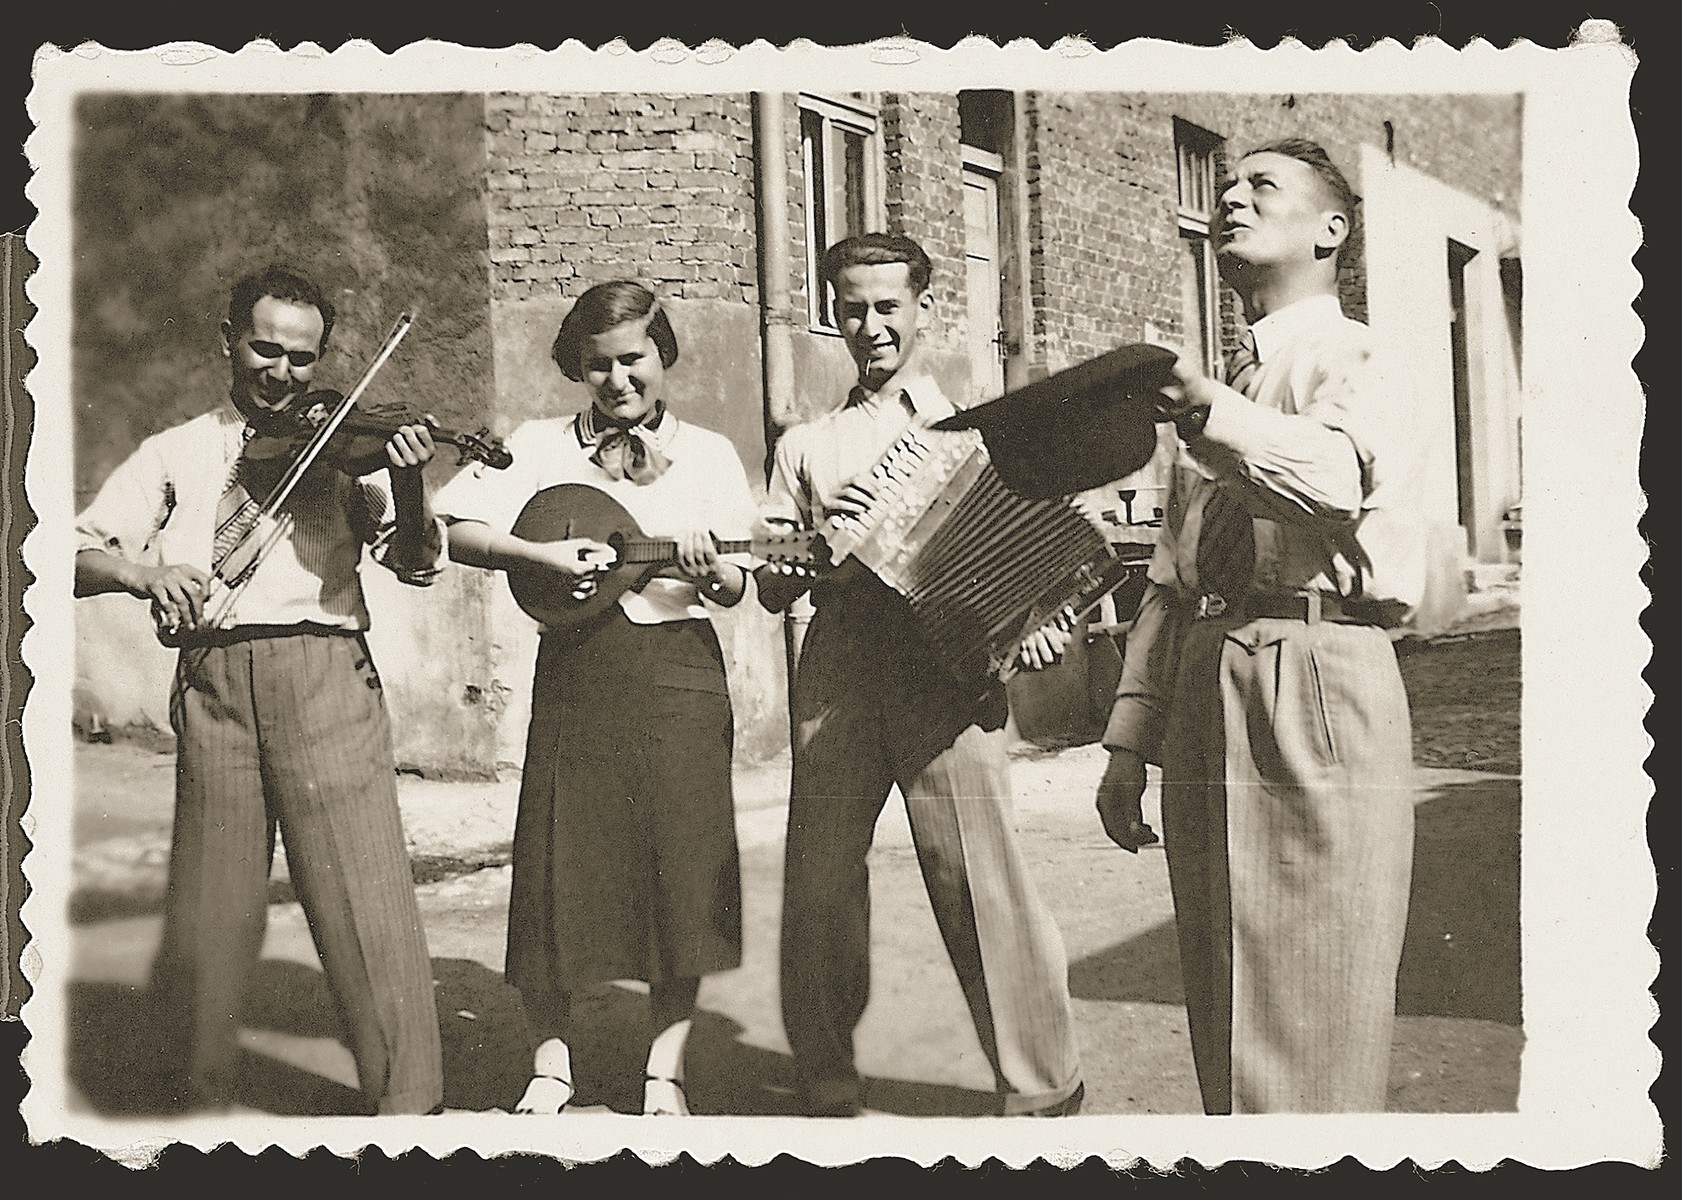 Chiel, Genia, Josef and Szlomo Gelbard perform an outdoor musical recital.